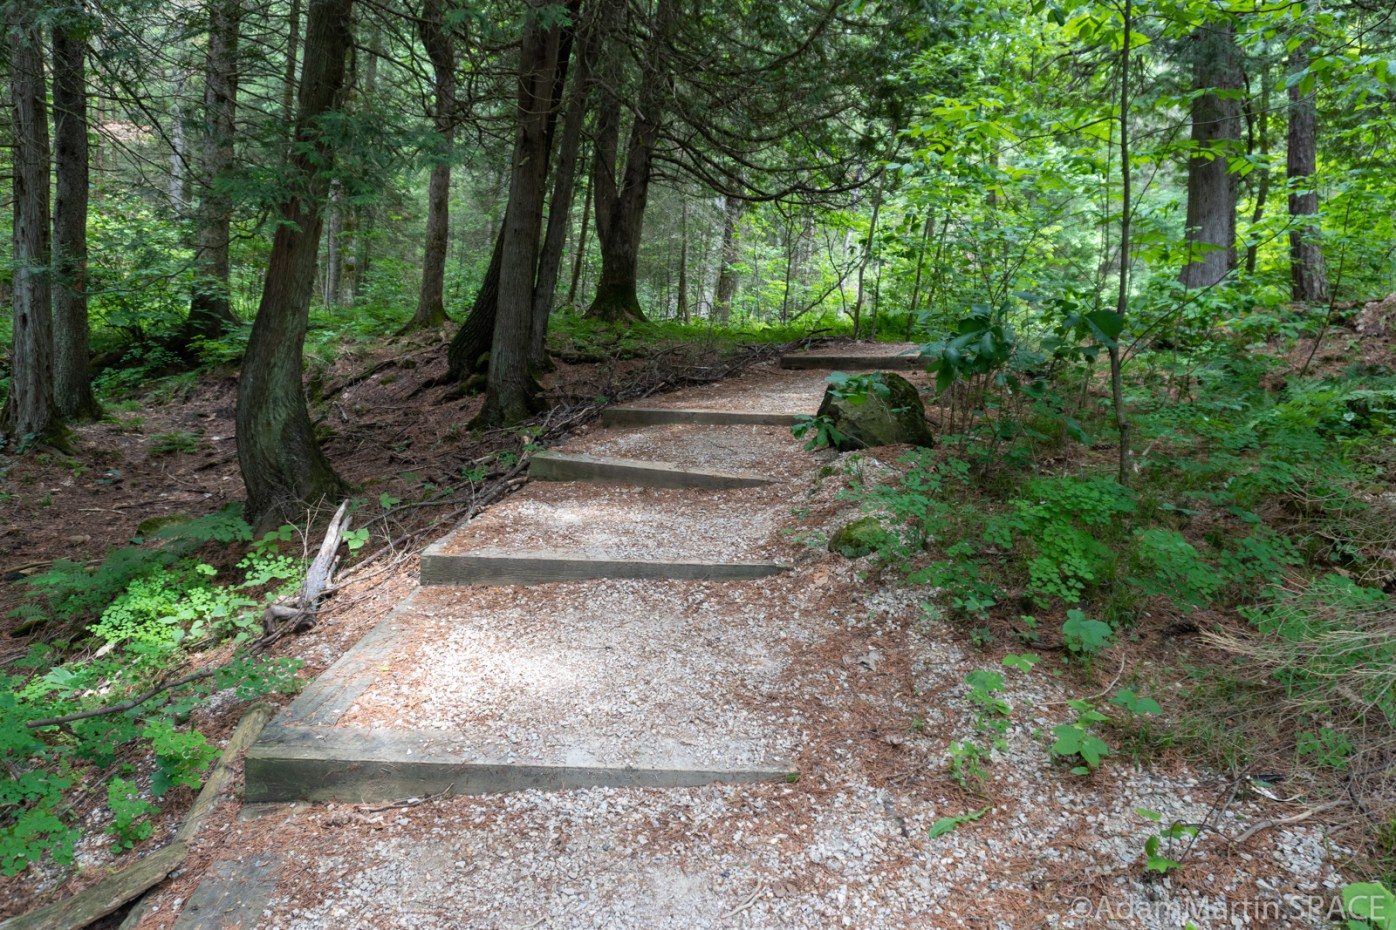 Quiver Falls Rapids - Short trail for river portages